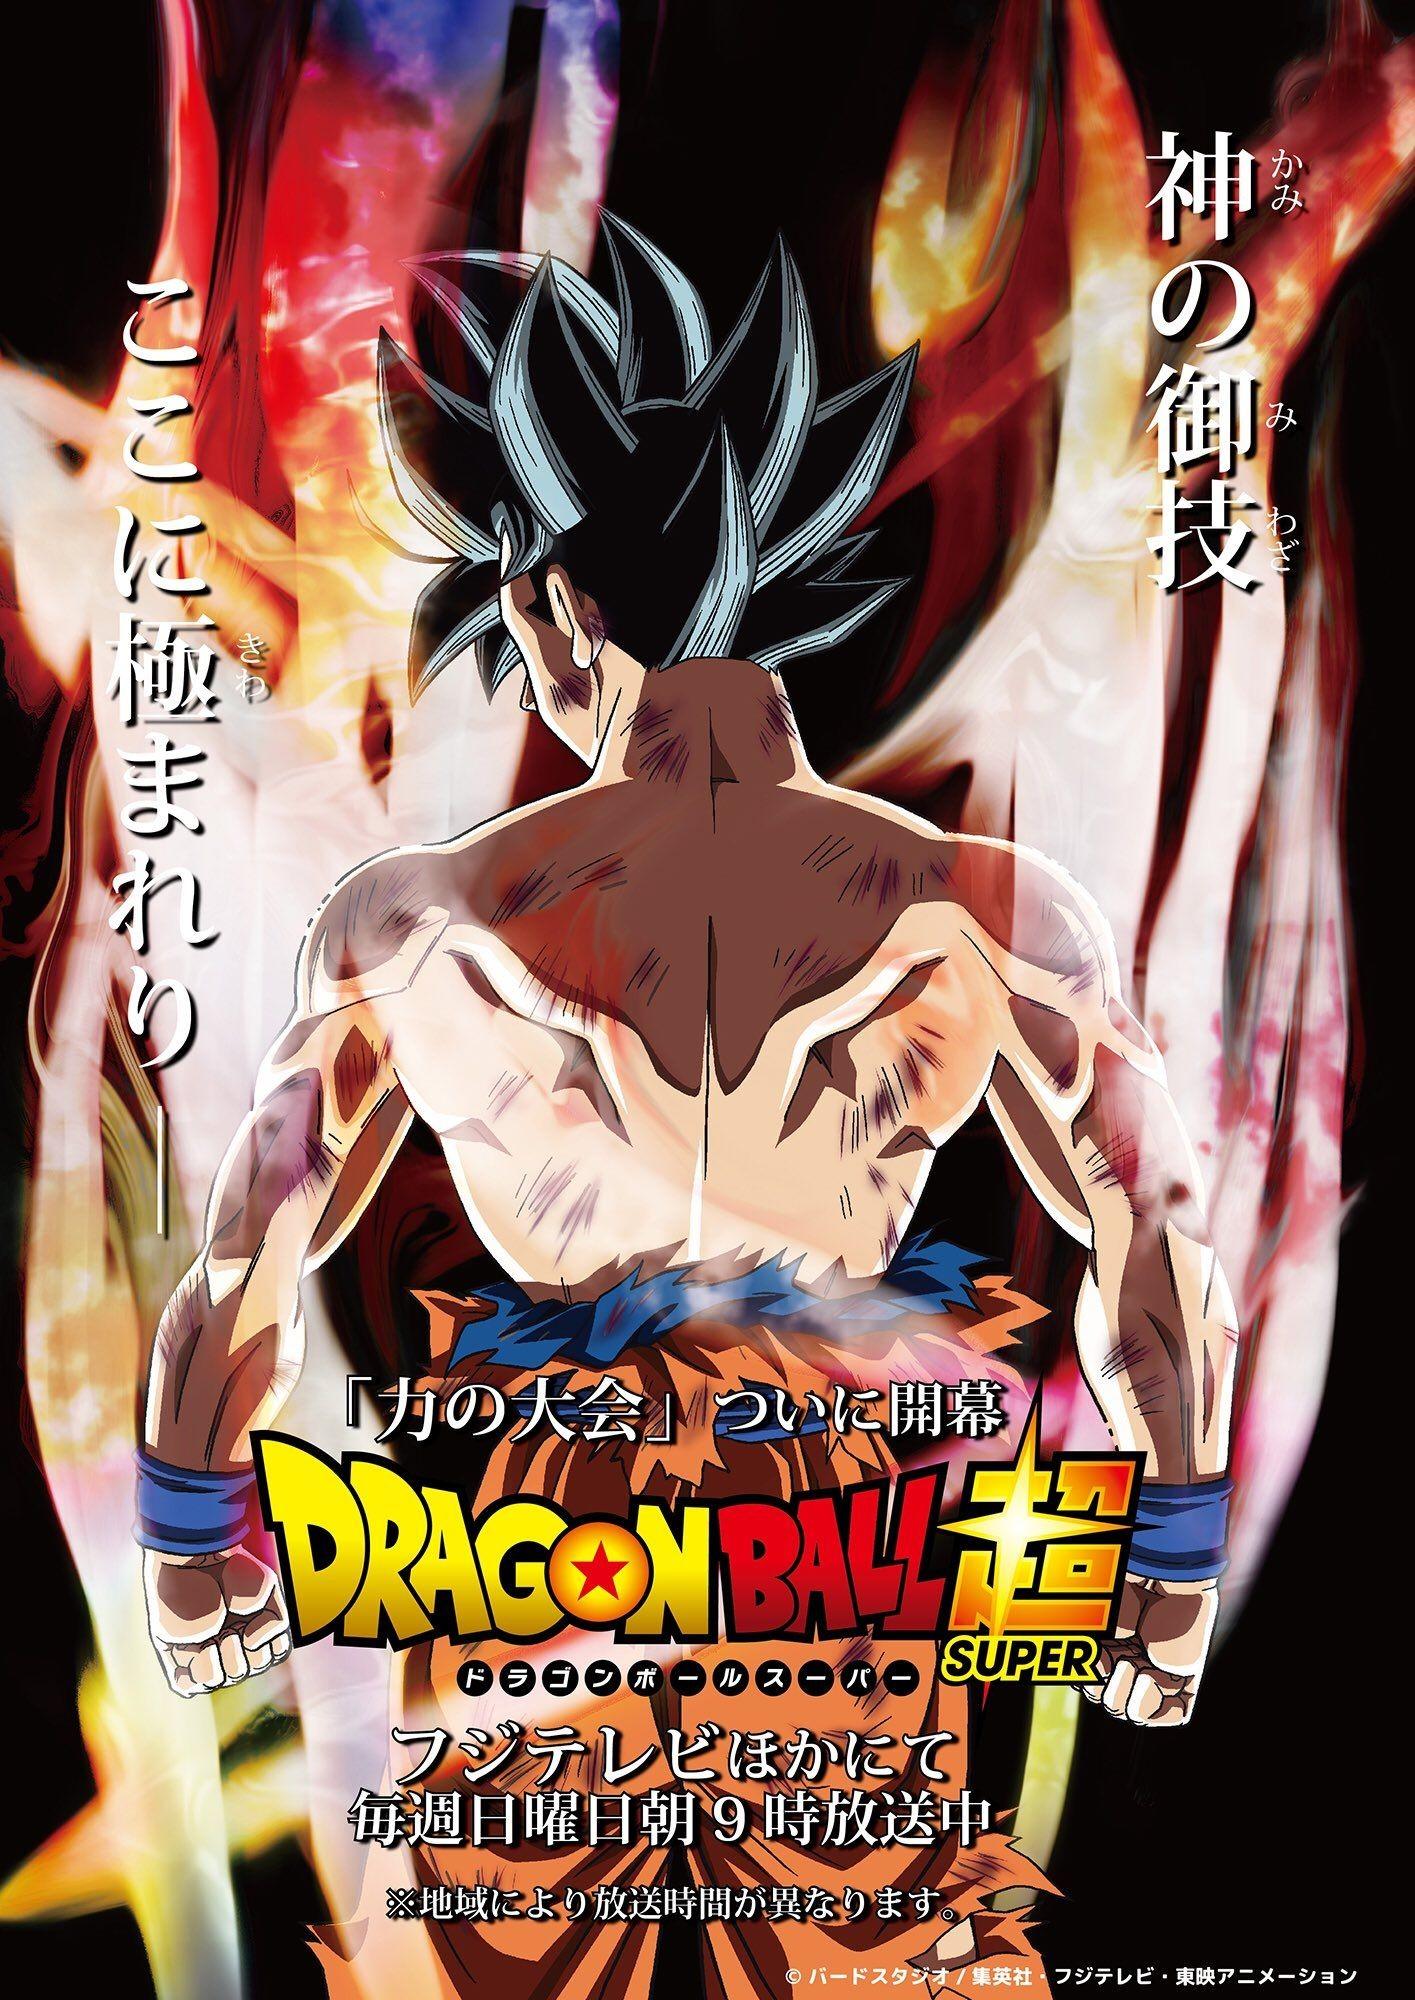 Res: 1415x2000, Goku New Form Wallpaper For iPhone - Best Wallpaper HD